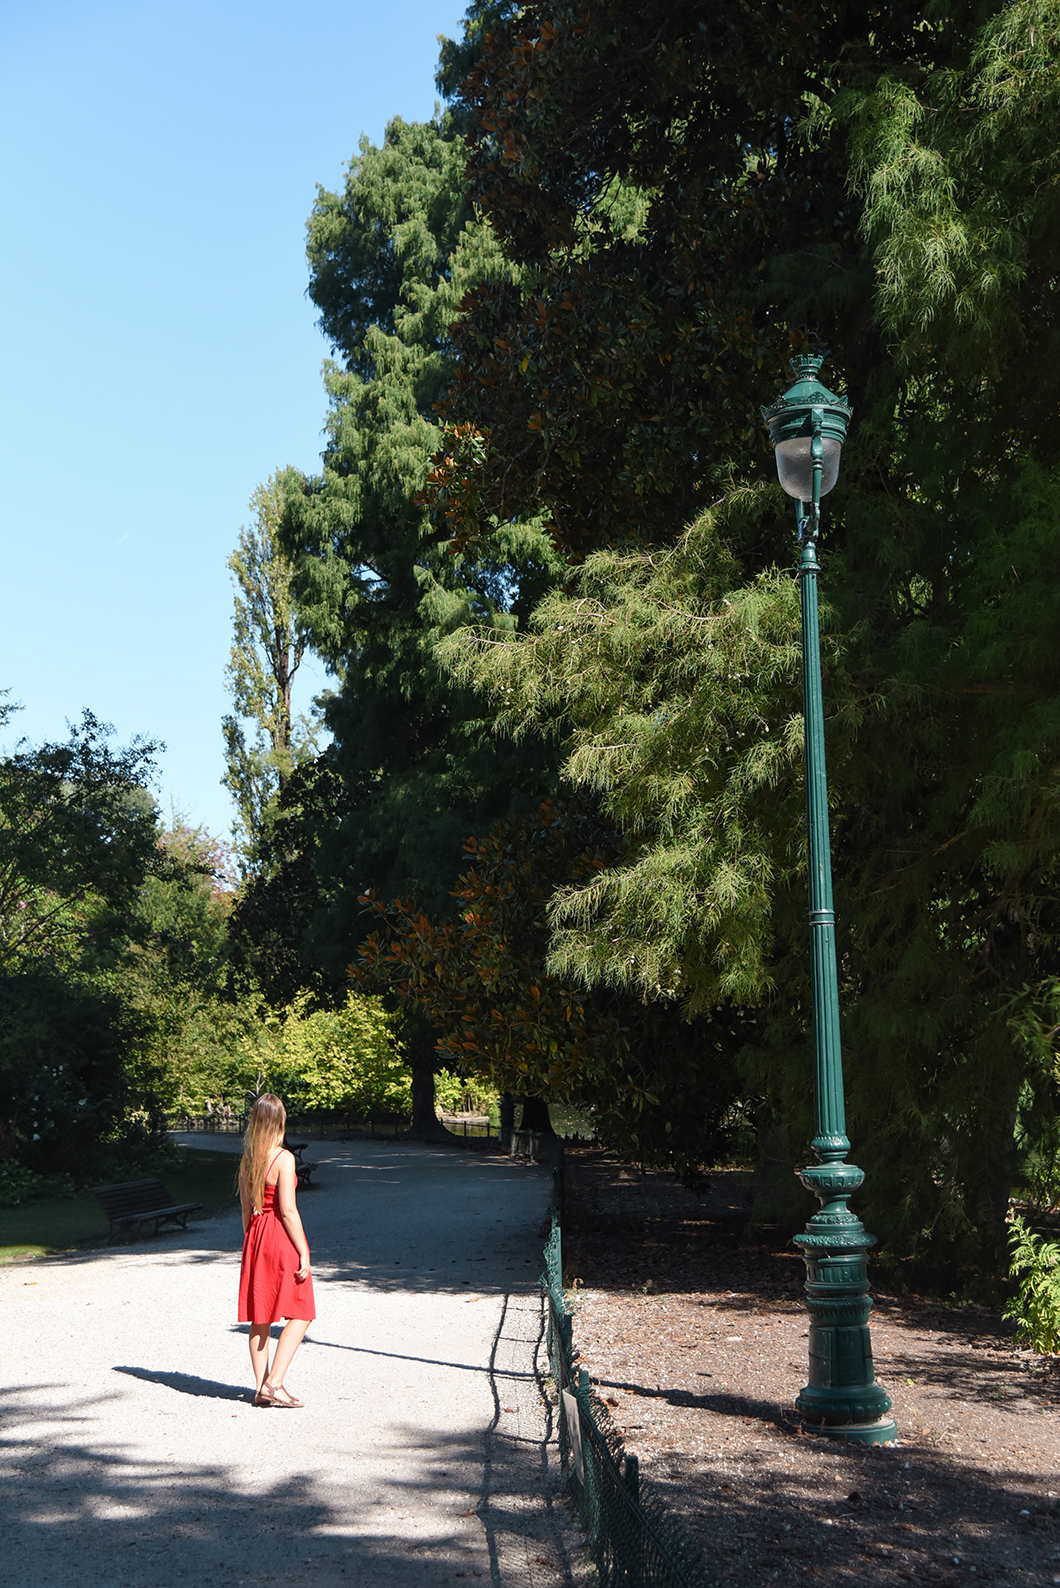 Balade au Jardin Public de Bordeaux